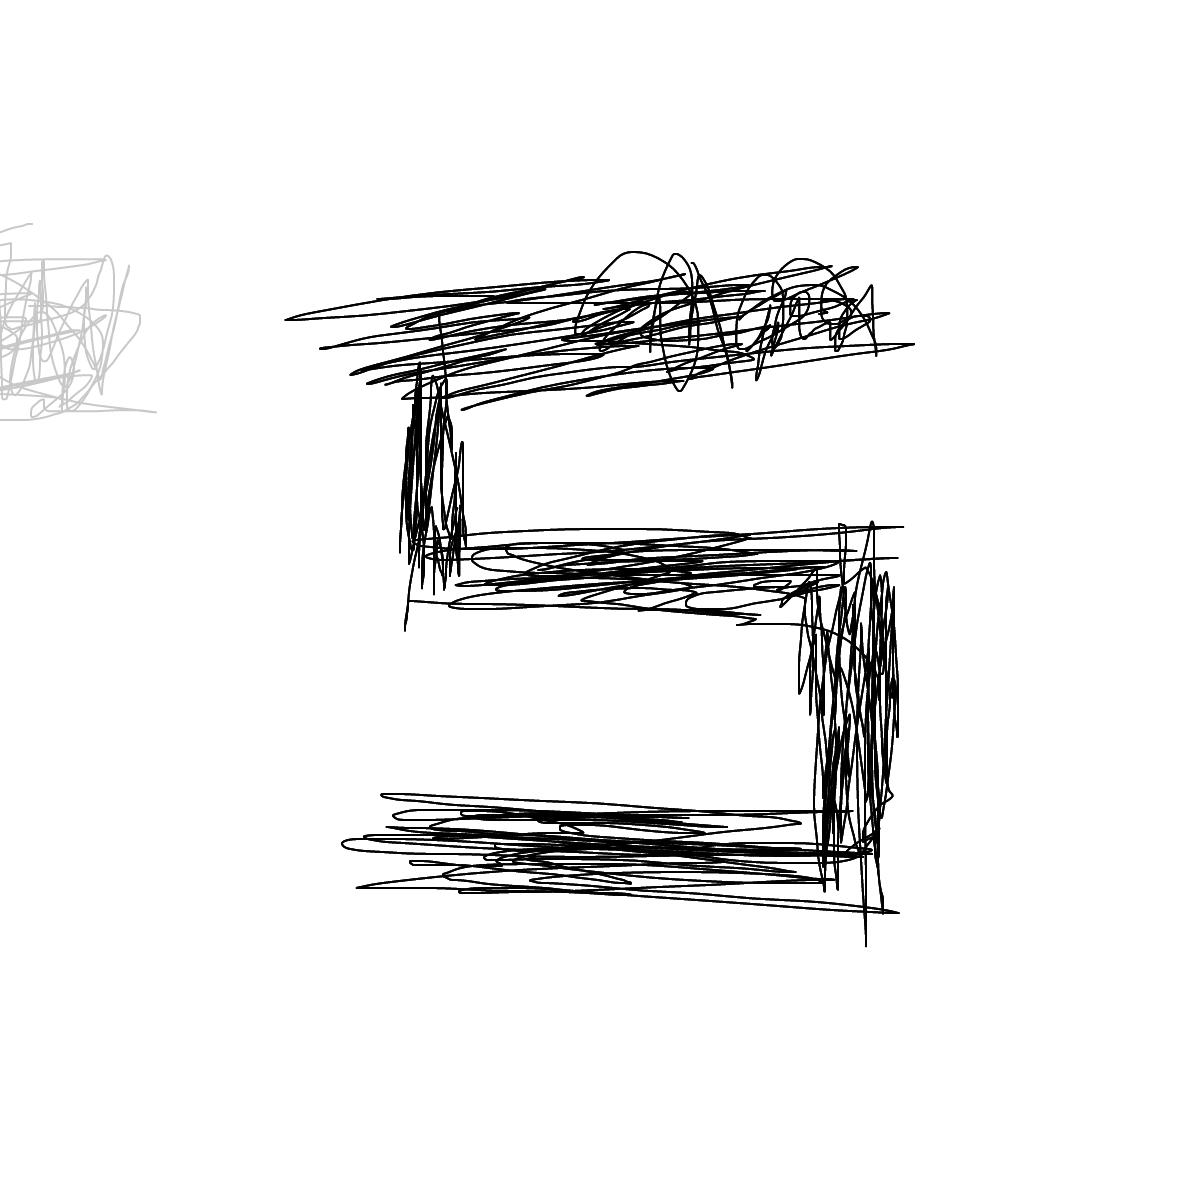 BAAAM drawing#17665 lat:49.2999954223632800lng: -122.7786254882812500